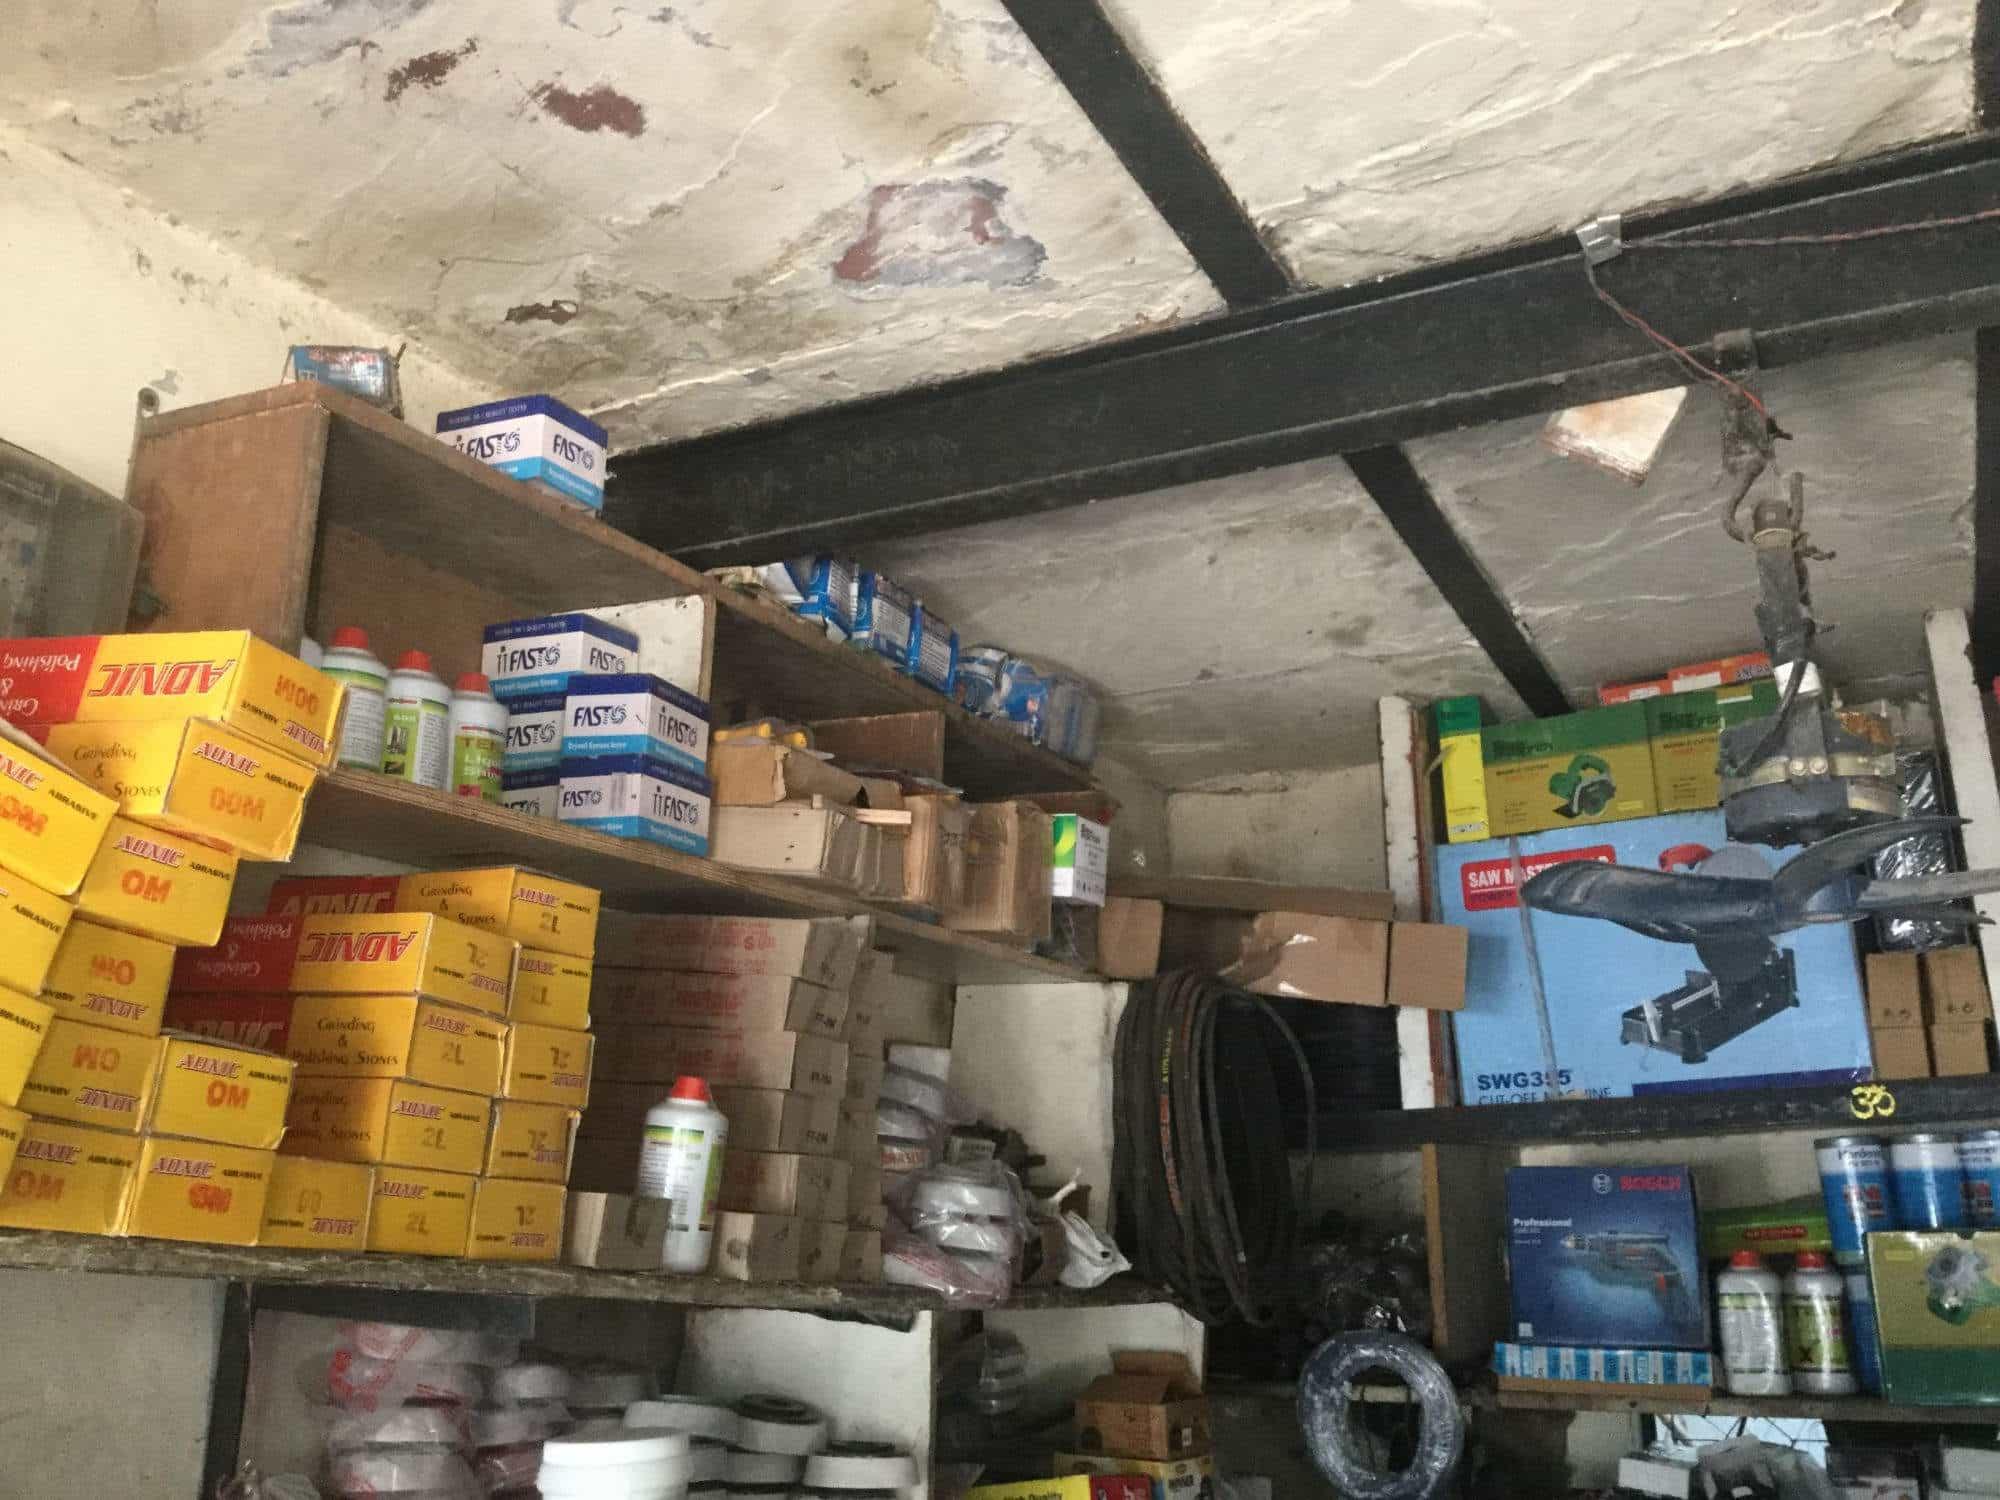 Ankit Traders And Repairing Centre, Raja Garden - Cutting